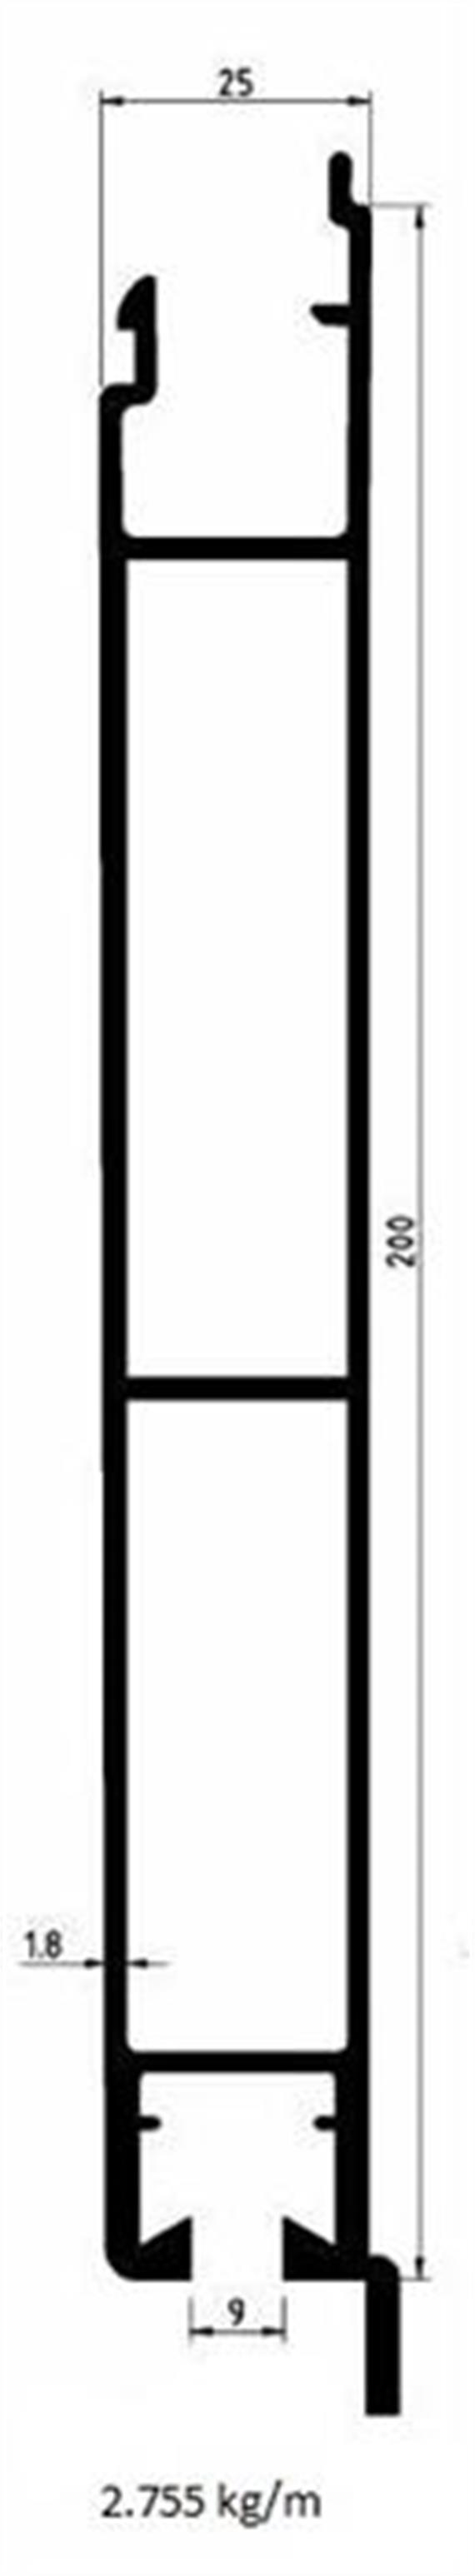 Bordwand unten 25 x 200 elox L=6300mm